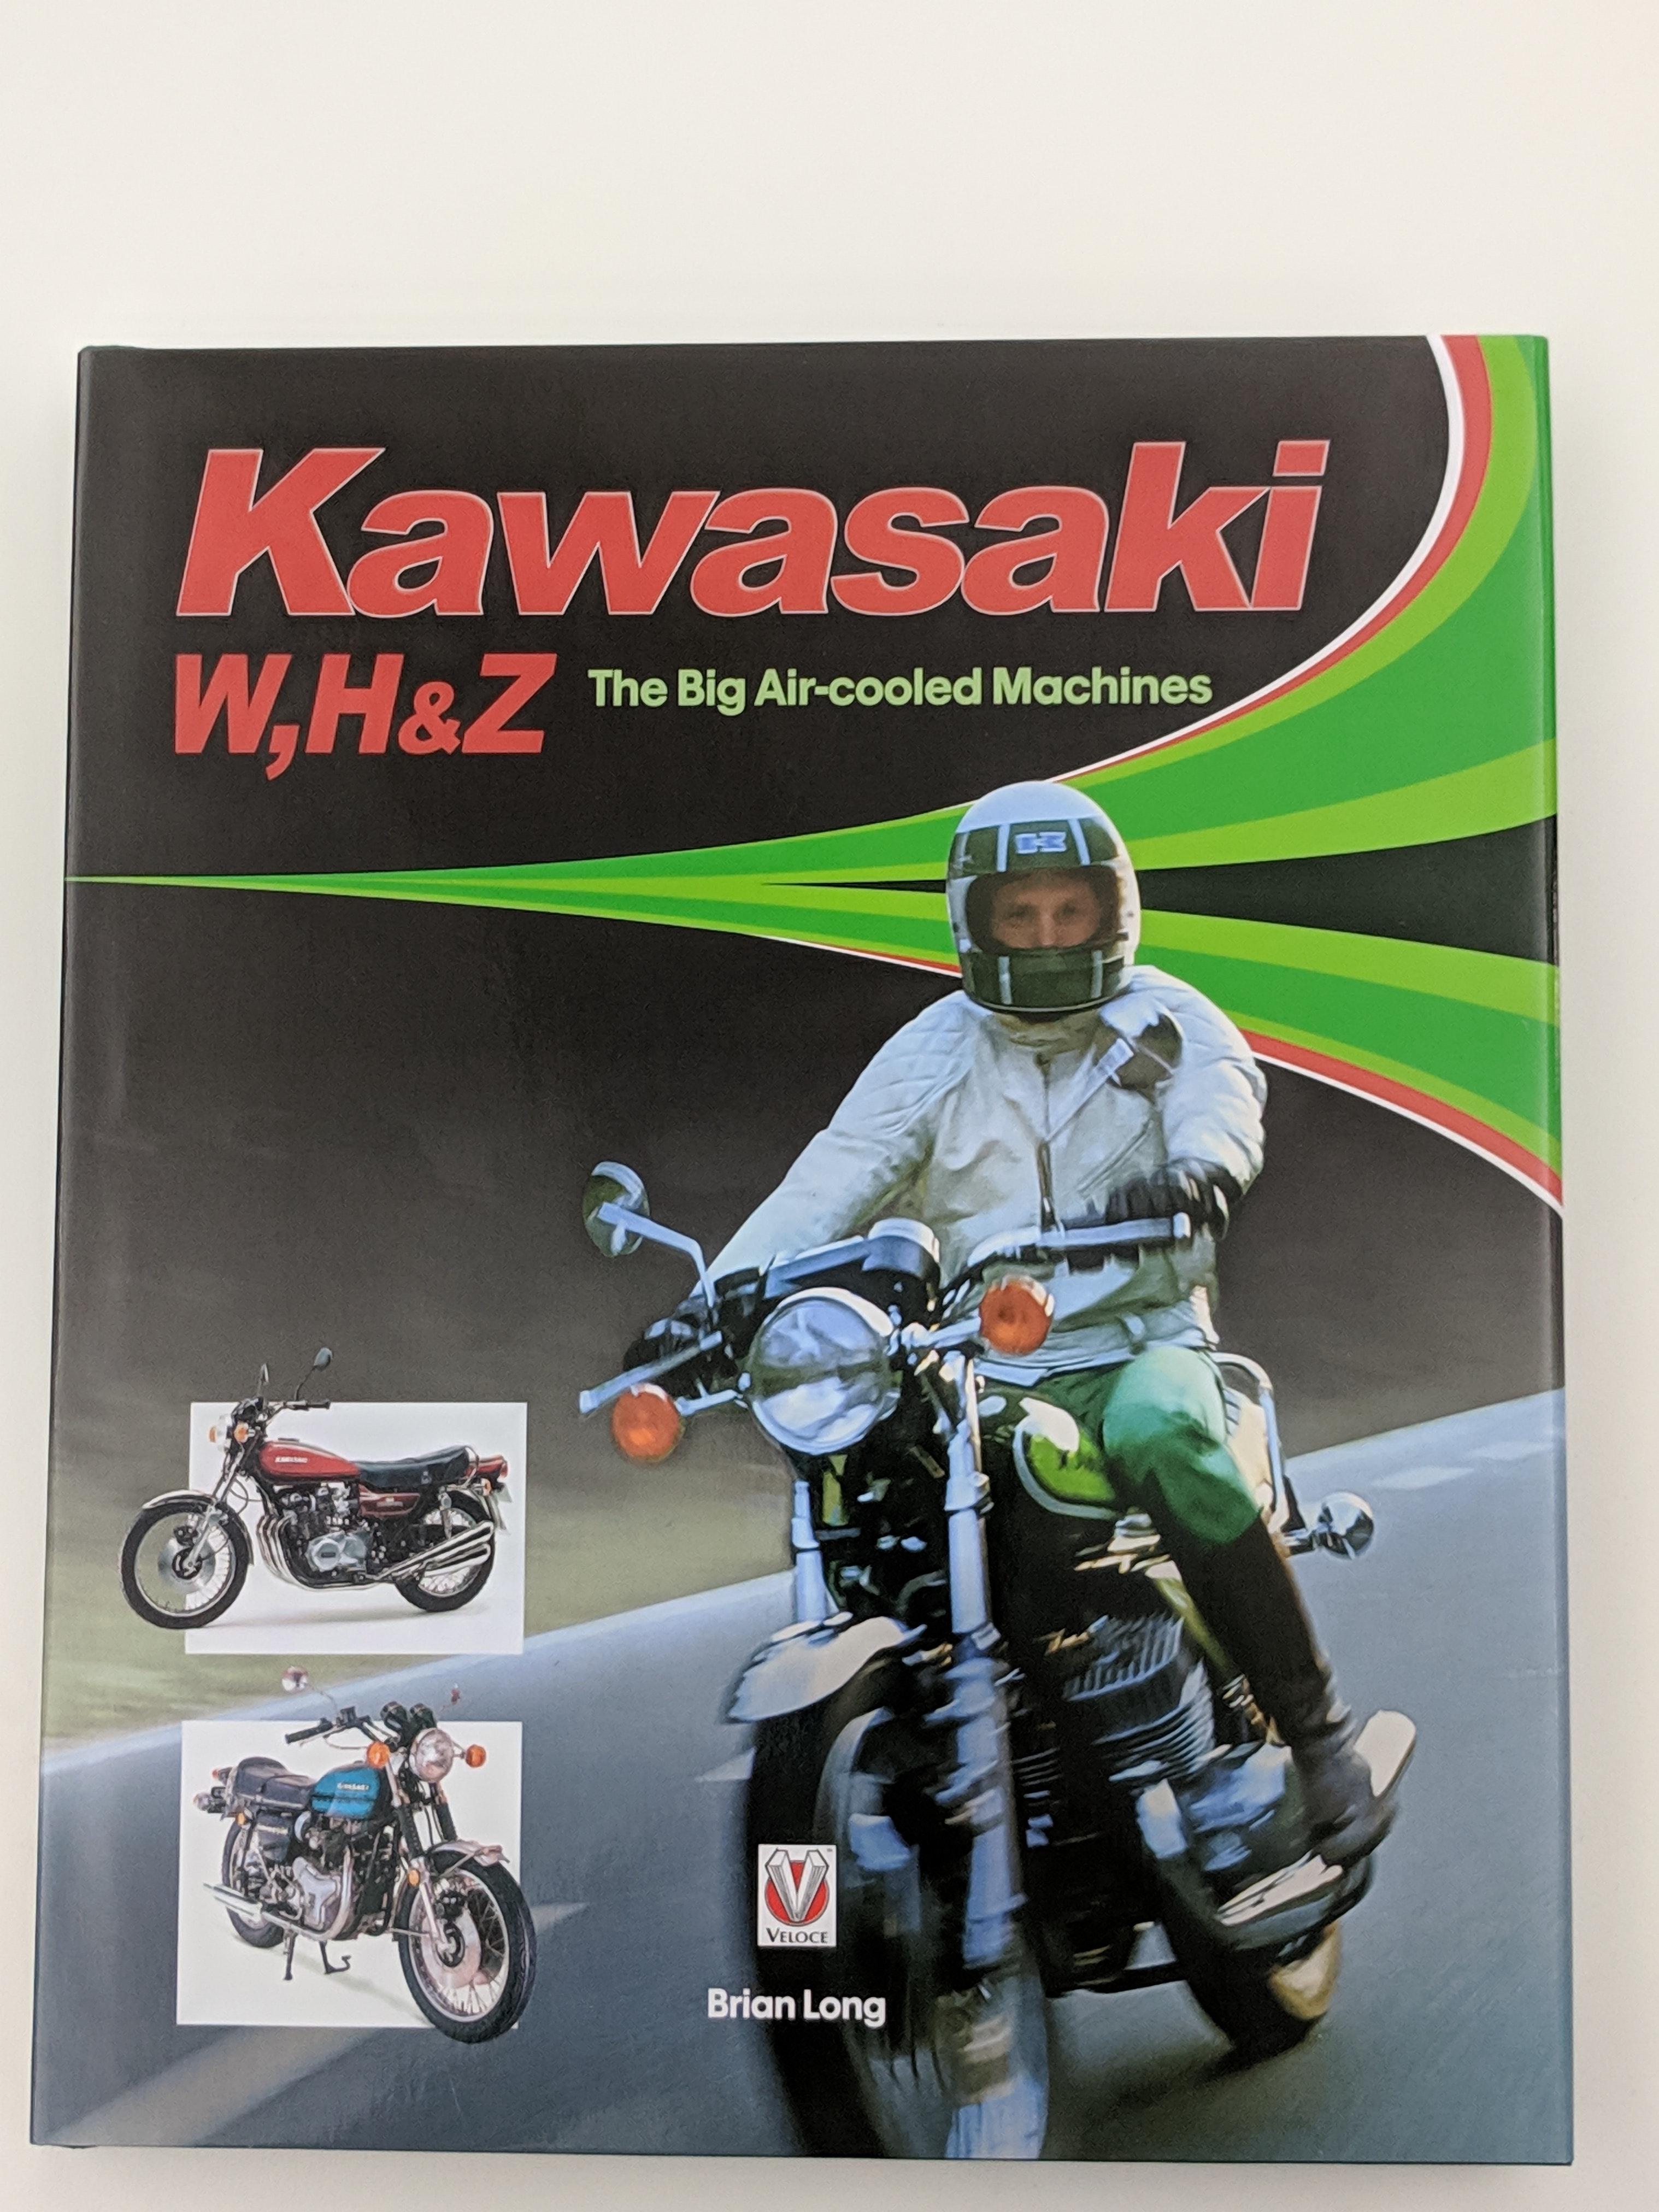 Kawasaki book sweepstakes